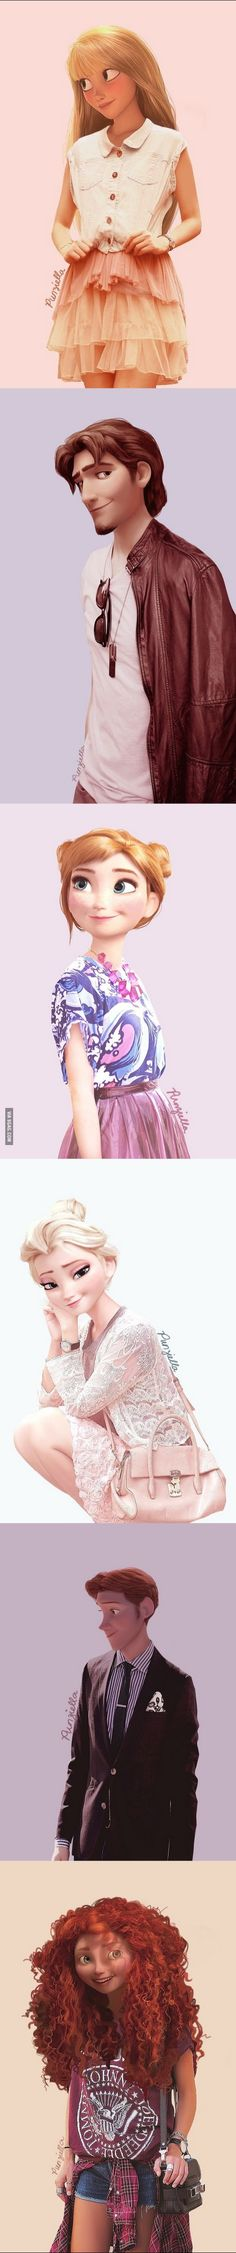 What Disney characters would look like in modern clothing. These look great! #disney #disneymashup